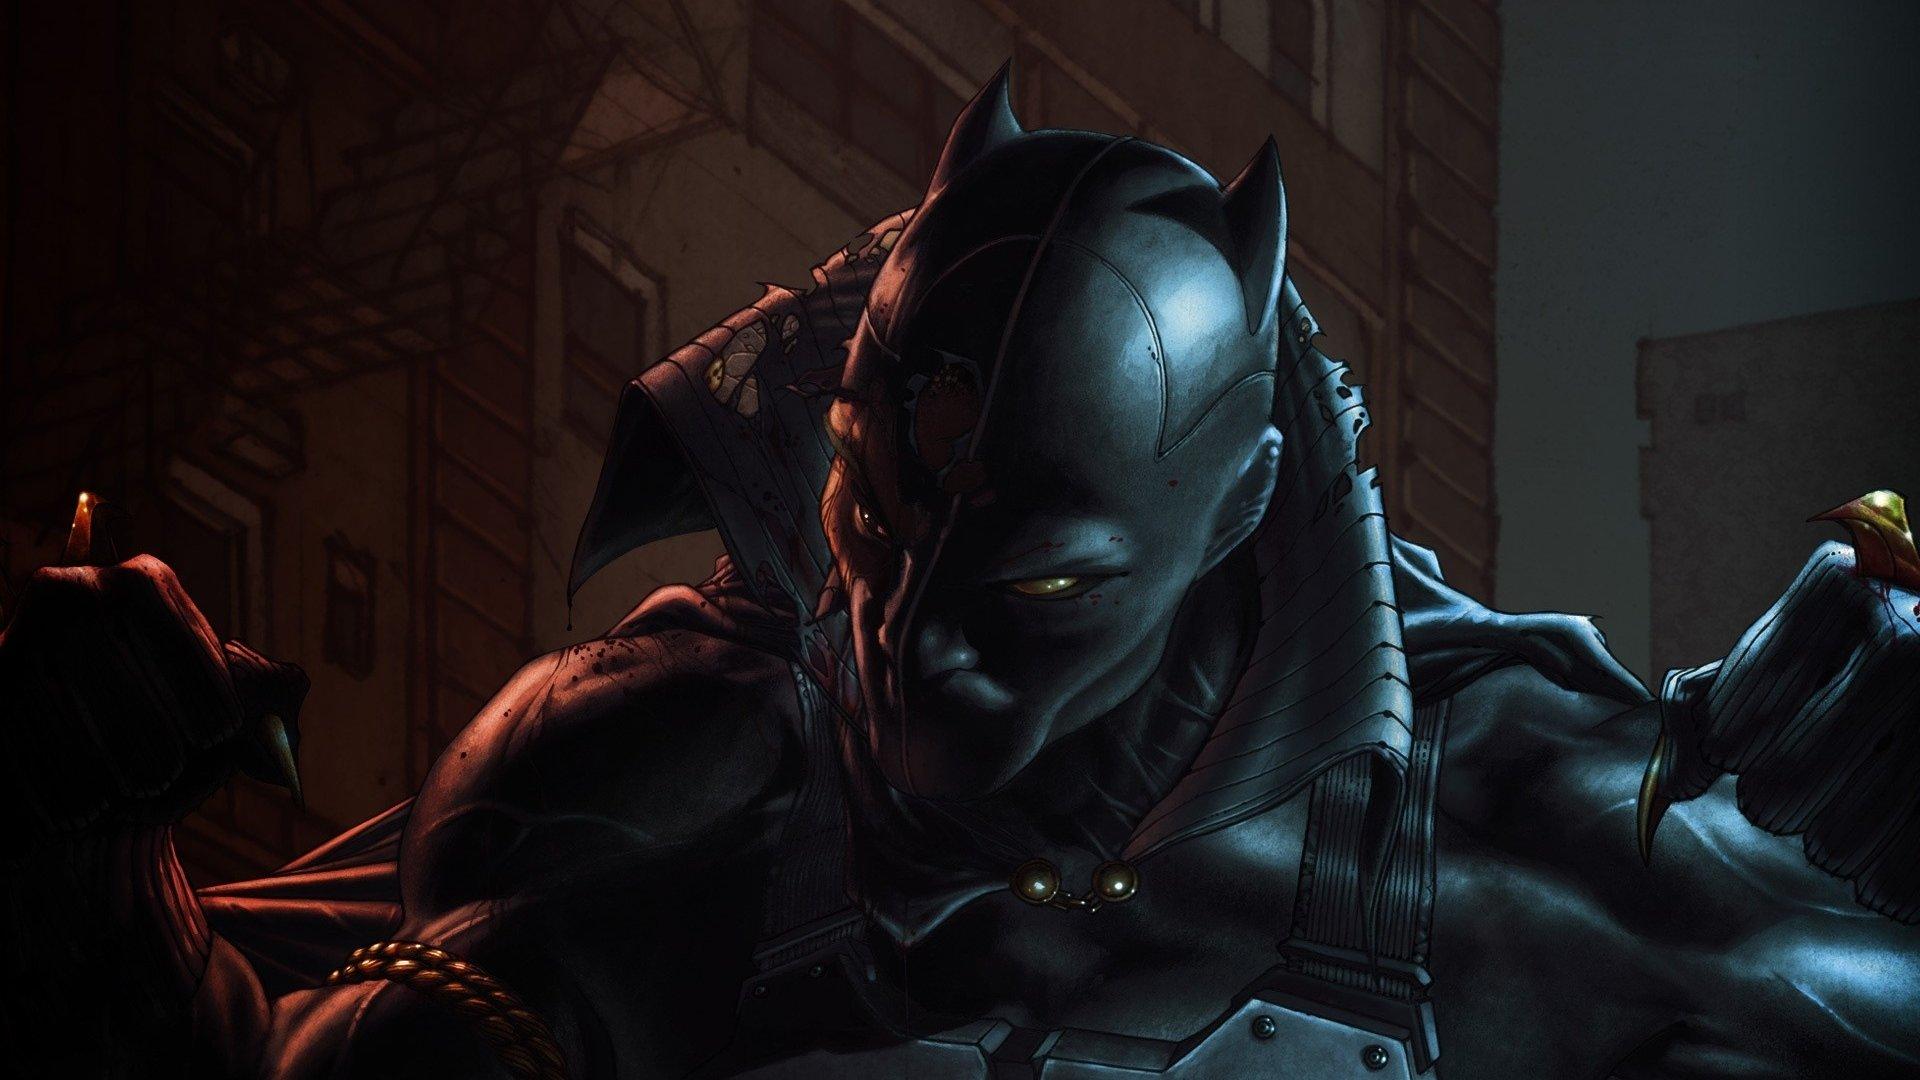 Free Download Black Panther Marvel Wallpaper Id 341845 Hd 1080p